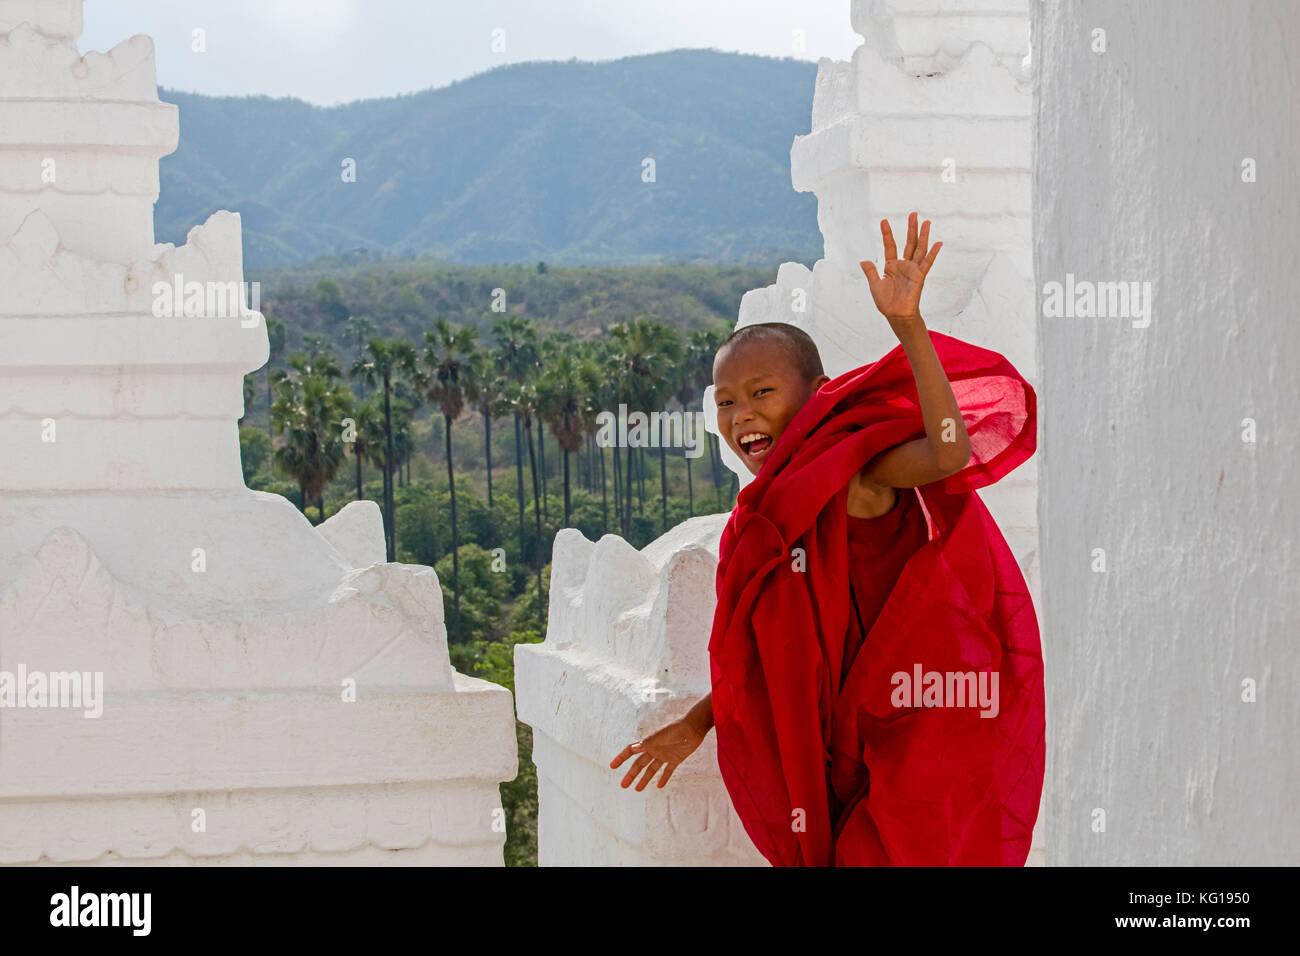 Joyeux moine novice souriant dans la Pagode Myatheindan pagode hsinbyume / temple, près de Mandalay mingun Photo Stock